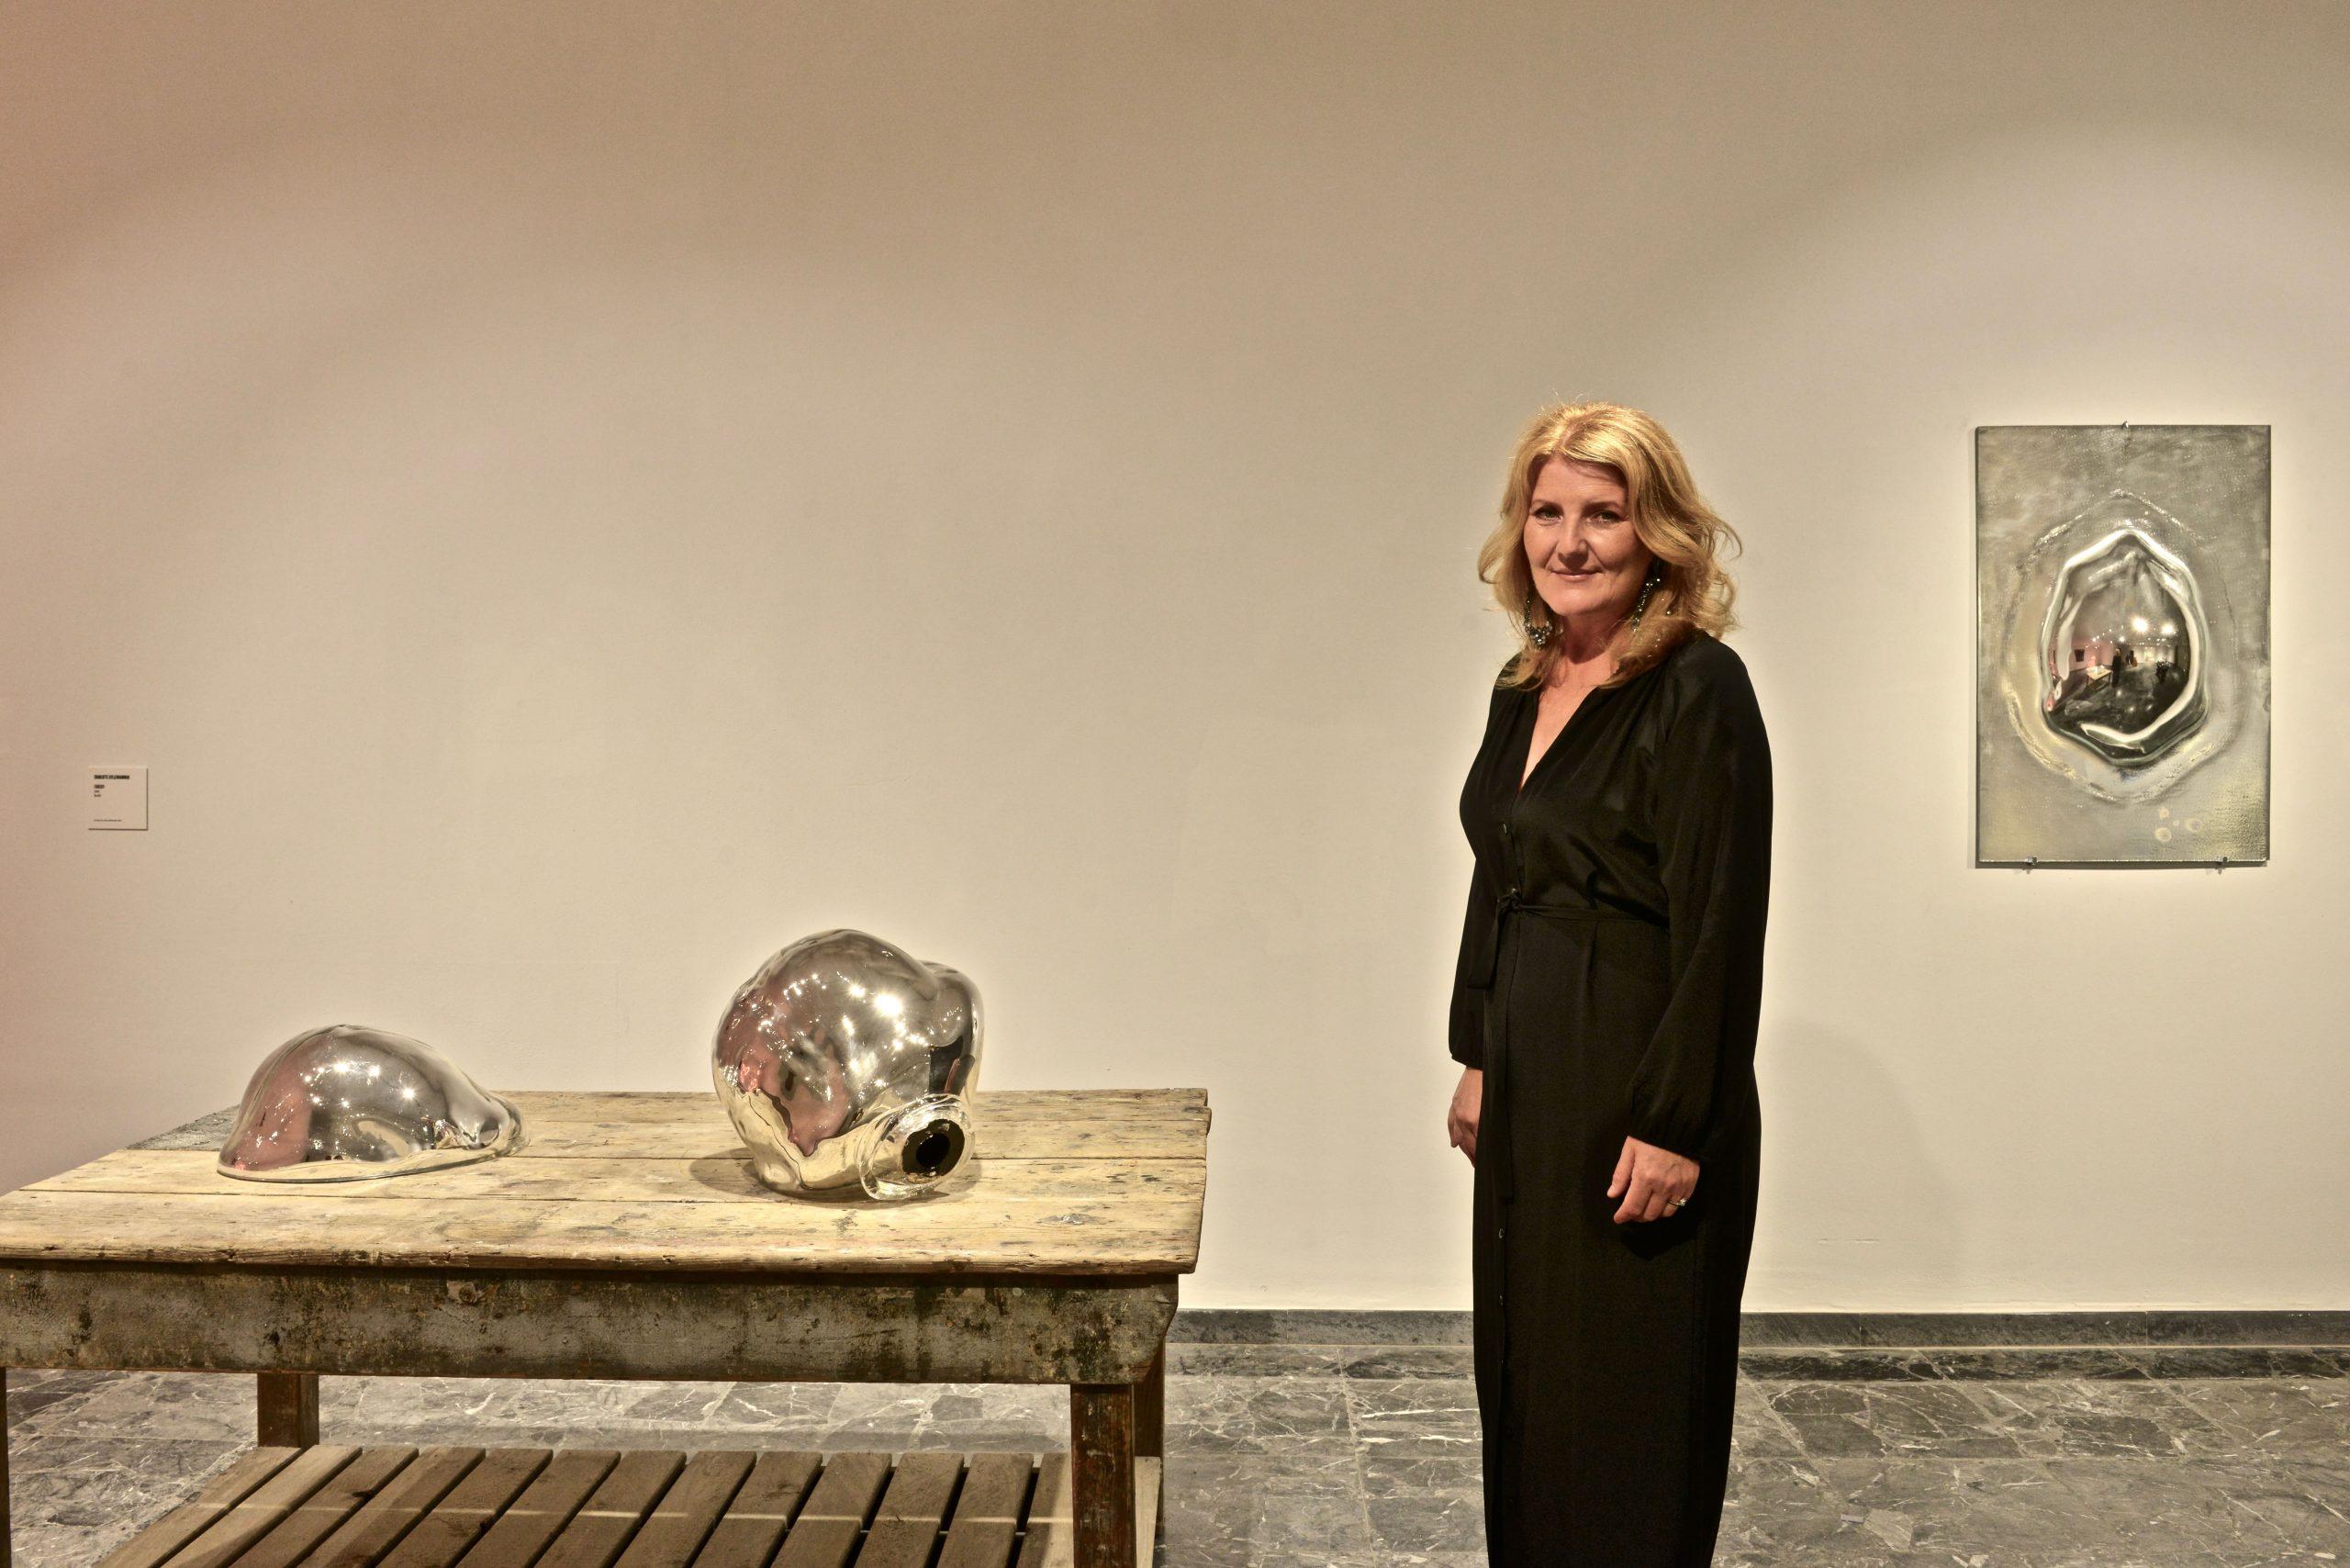 Charlotte Gyllenhammar at the Opening of Unbreakable: Women in Glass